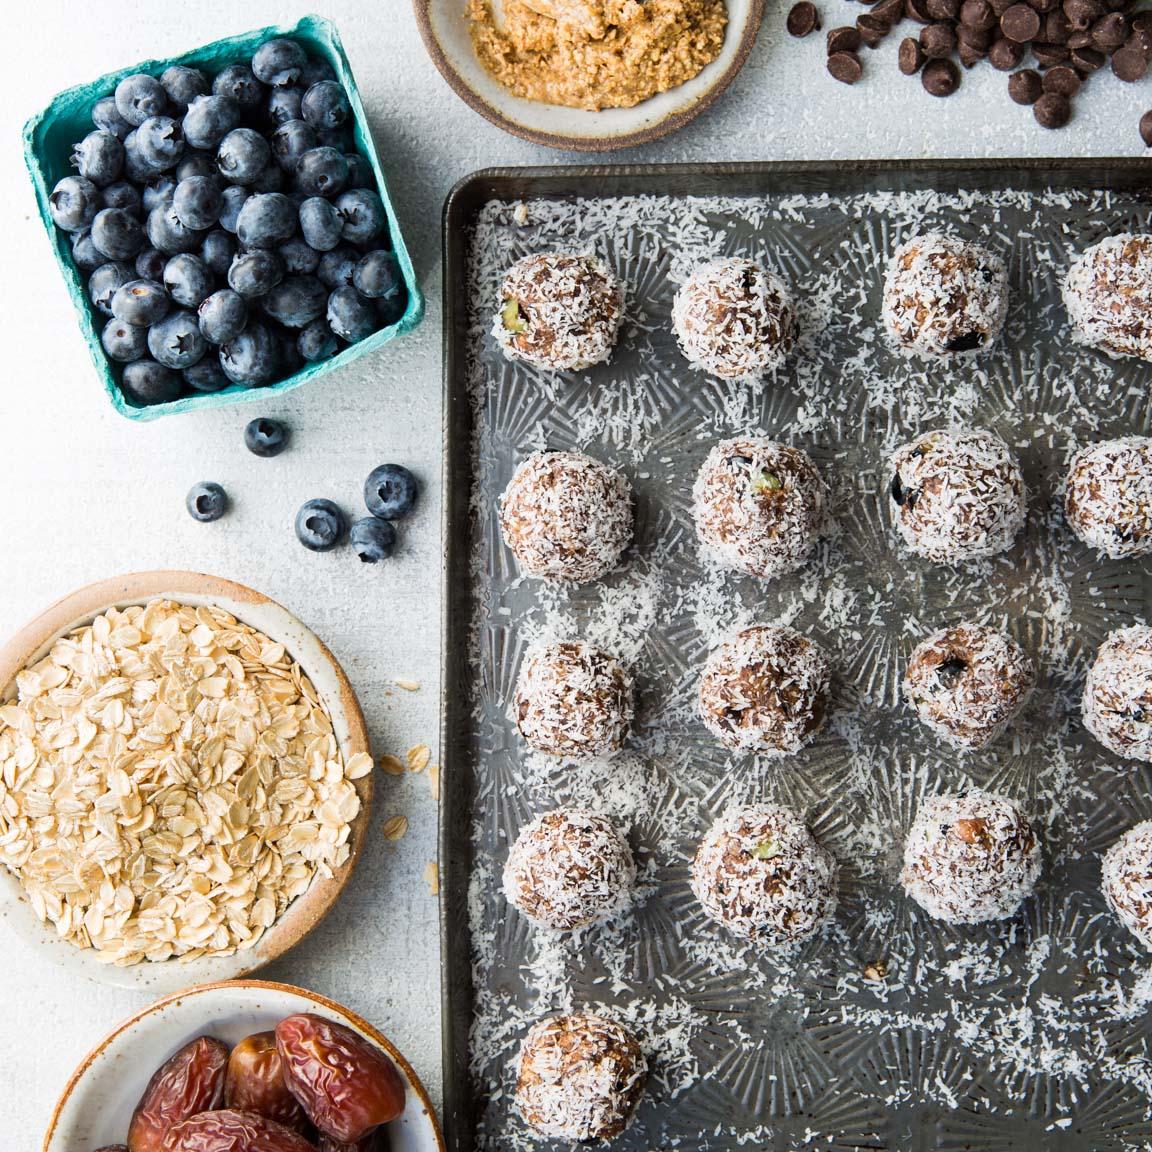 Blueberry Power Superfood Bites